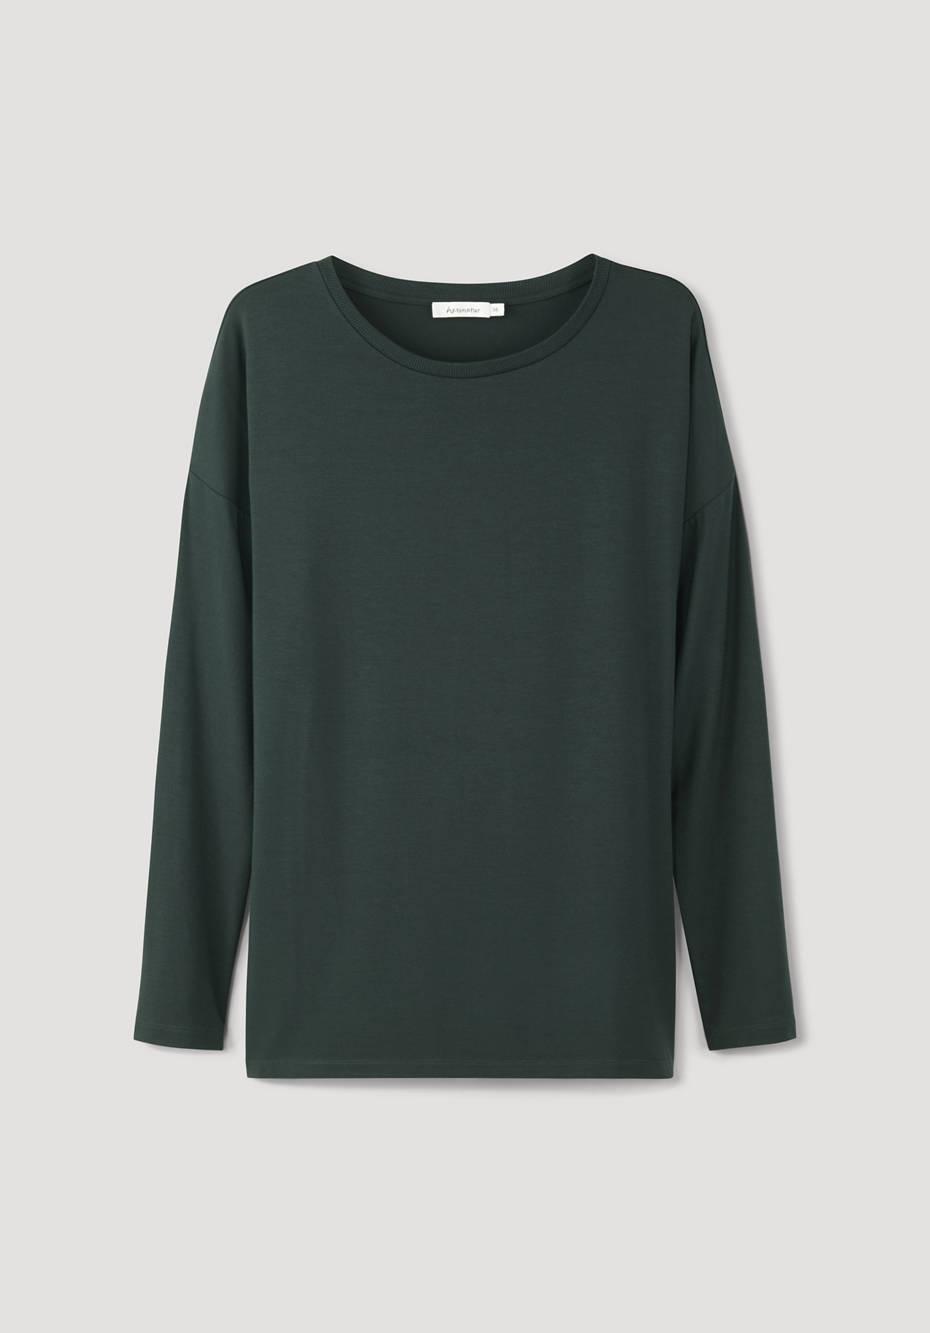 Long-sleeved shirt made from Tencel ™ Modal